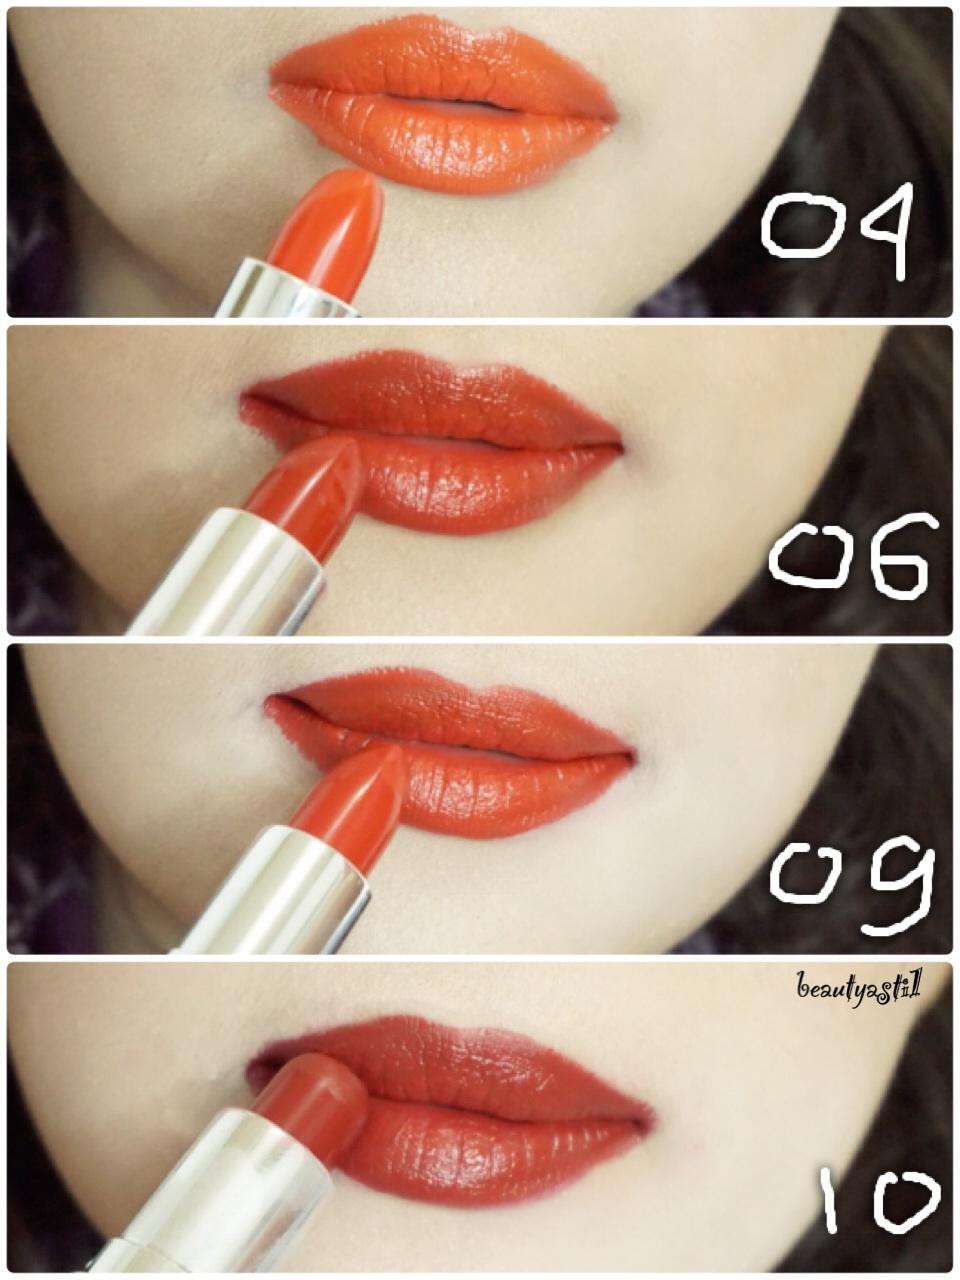 Wardah Matte Red Lipstick 04 06 09 10 Review Beautyasti1 Lip No 8 Ingredients